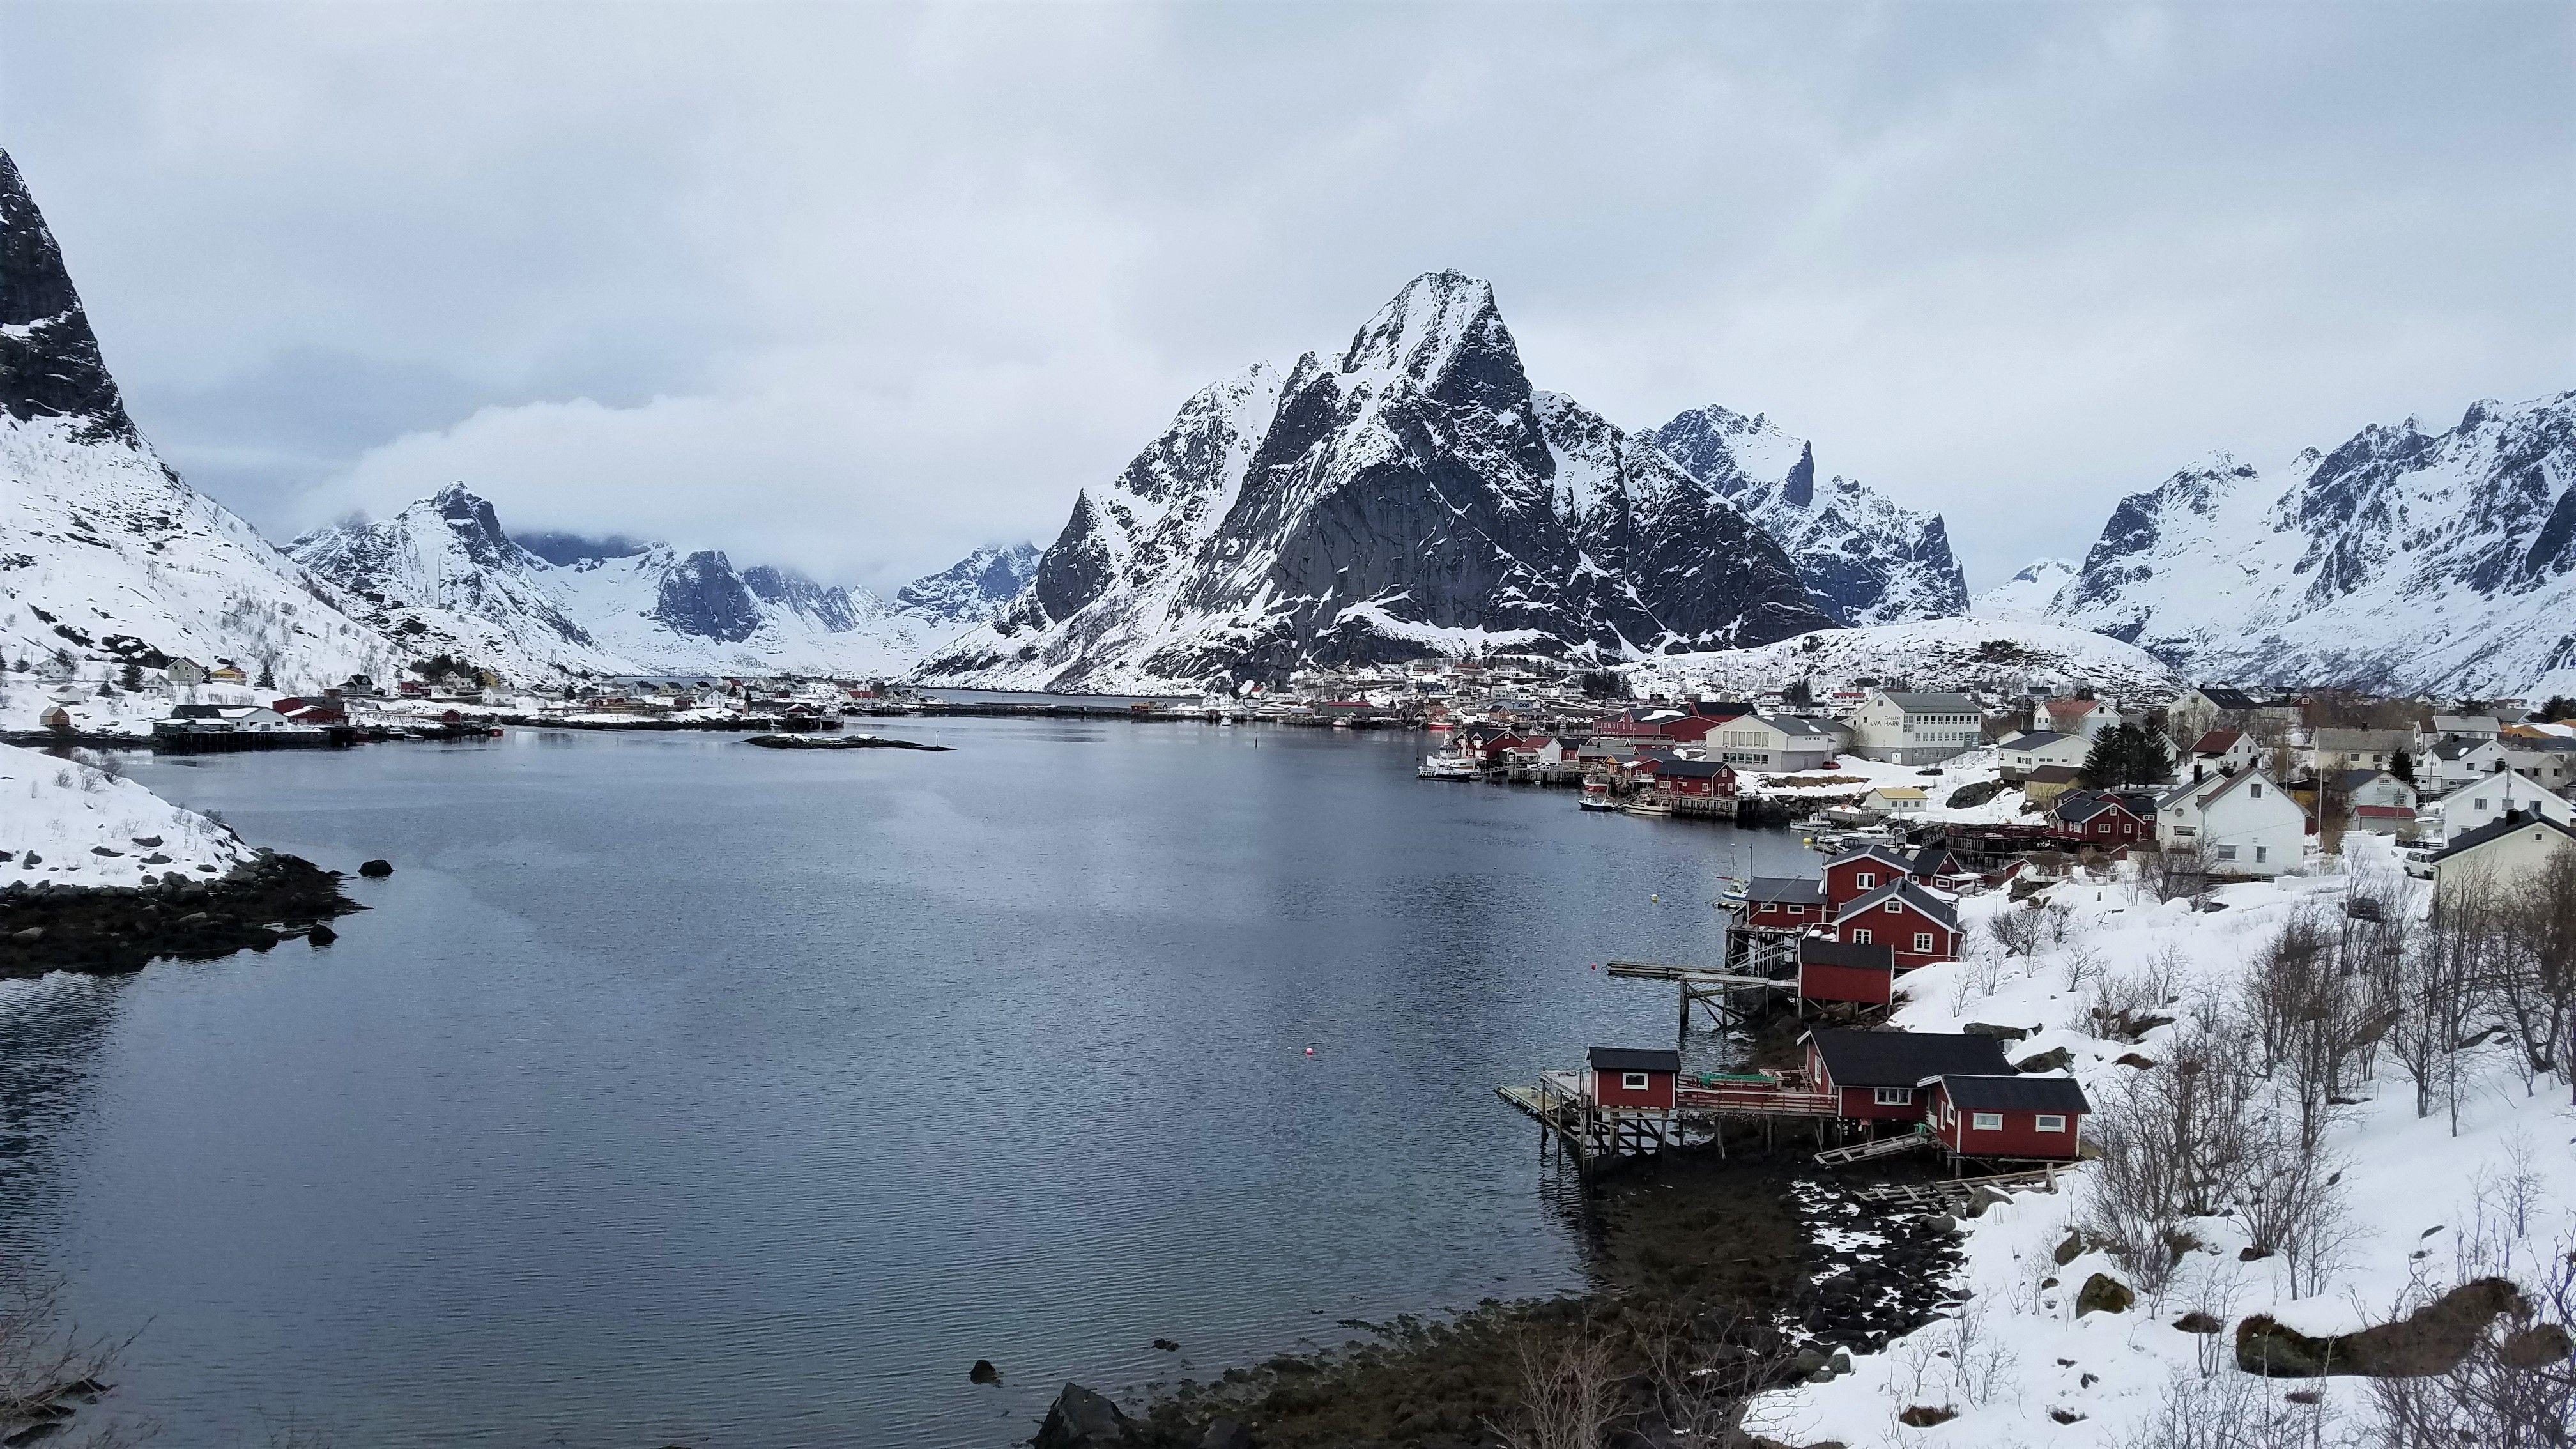 Reine Norway in the Lofoten Archipelago last spring. Those